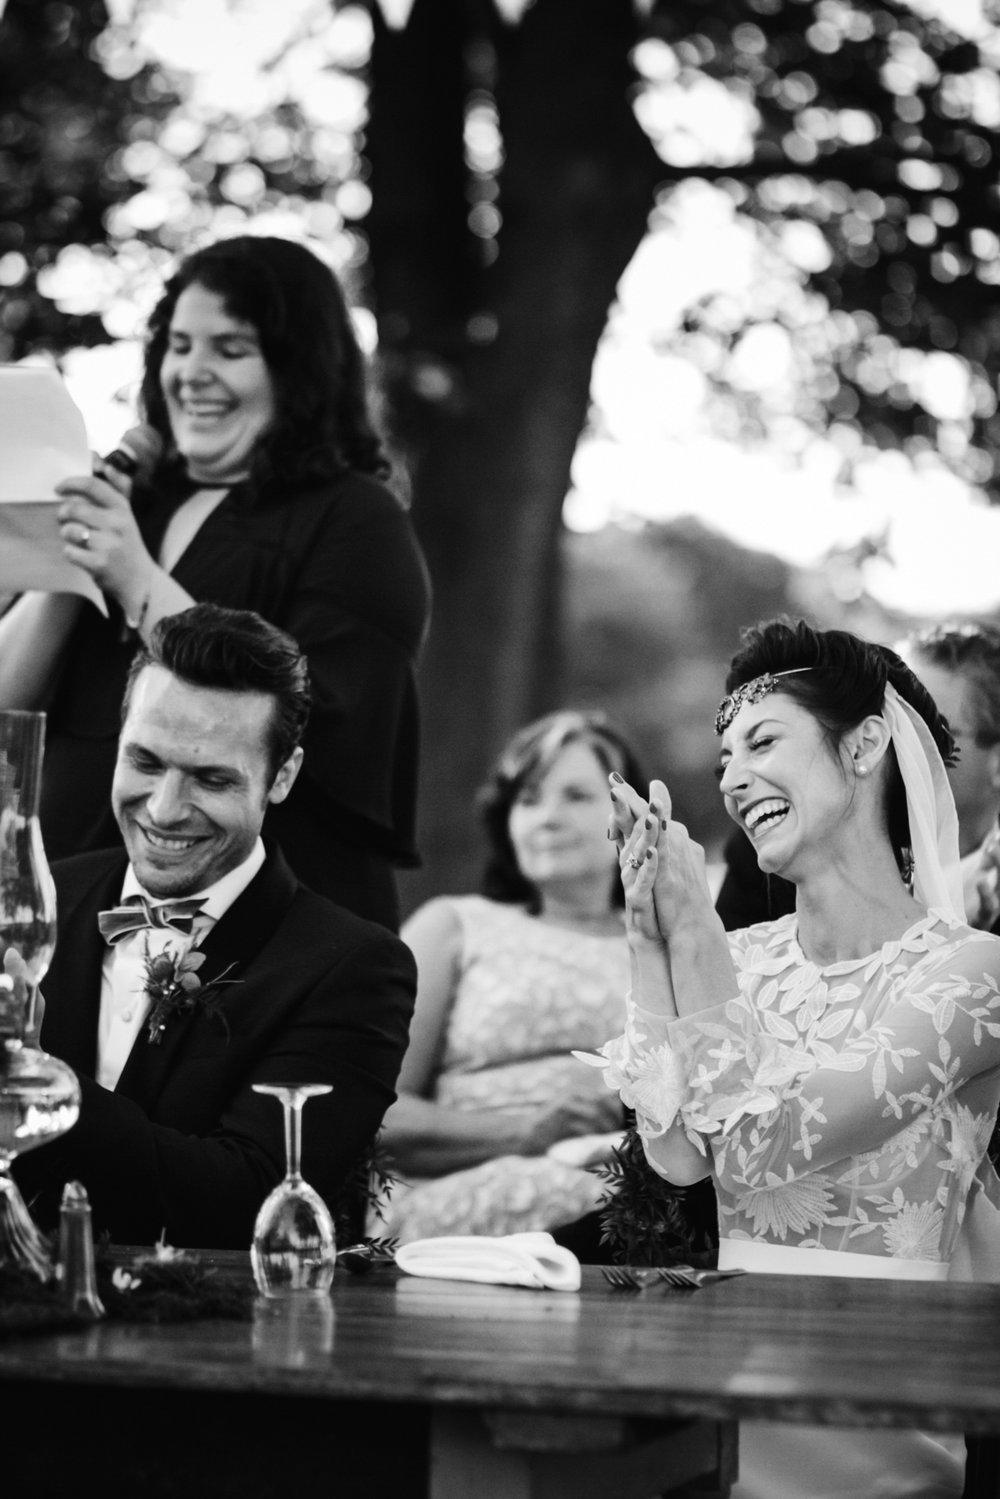 Kimberly-Coccagnia-Wedding-Photographer-239.JPG